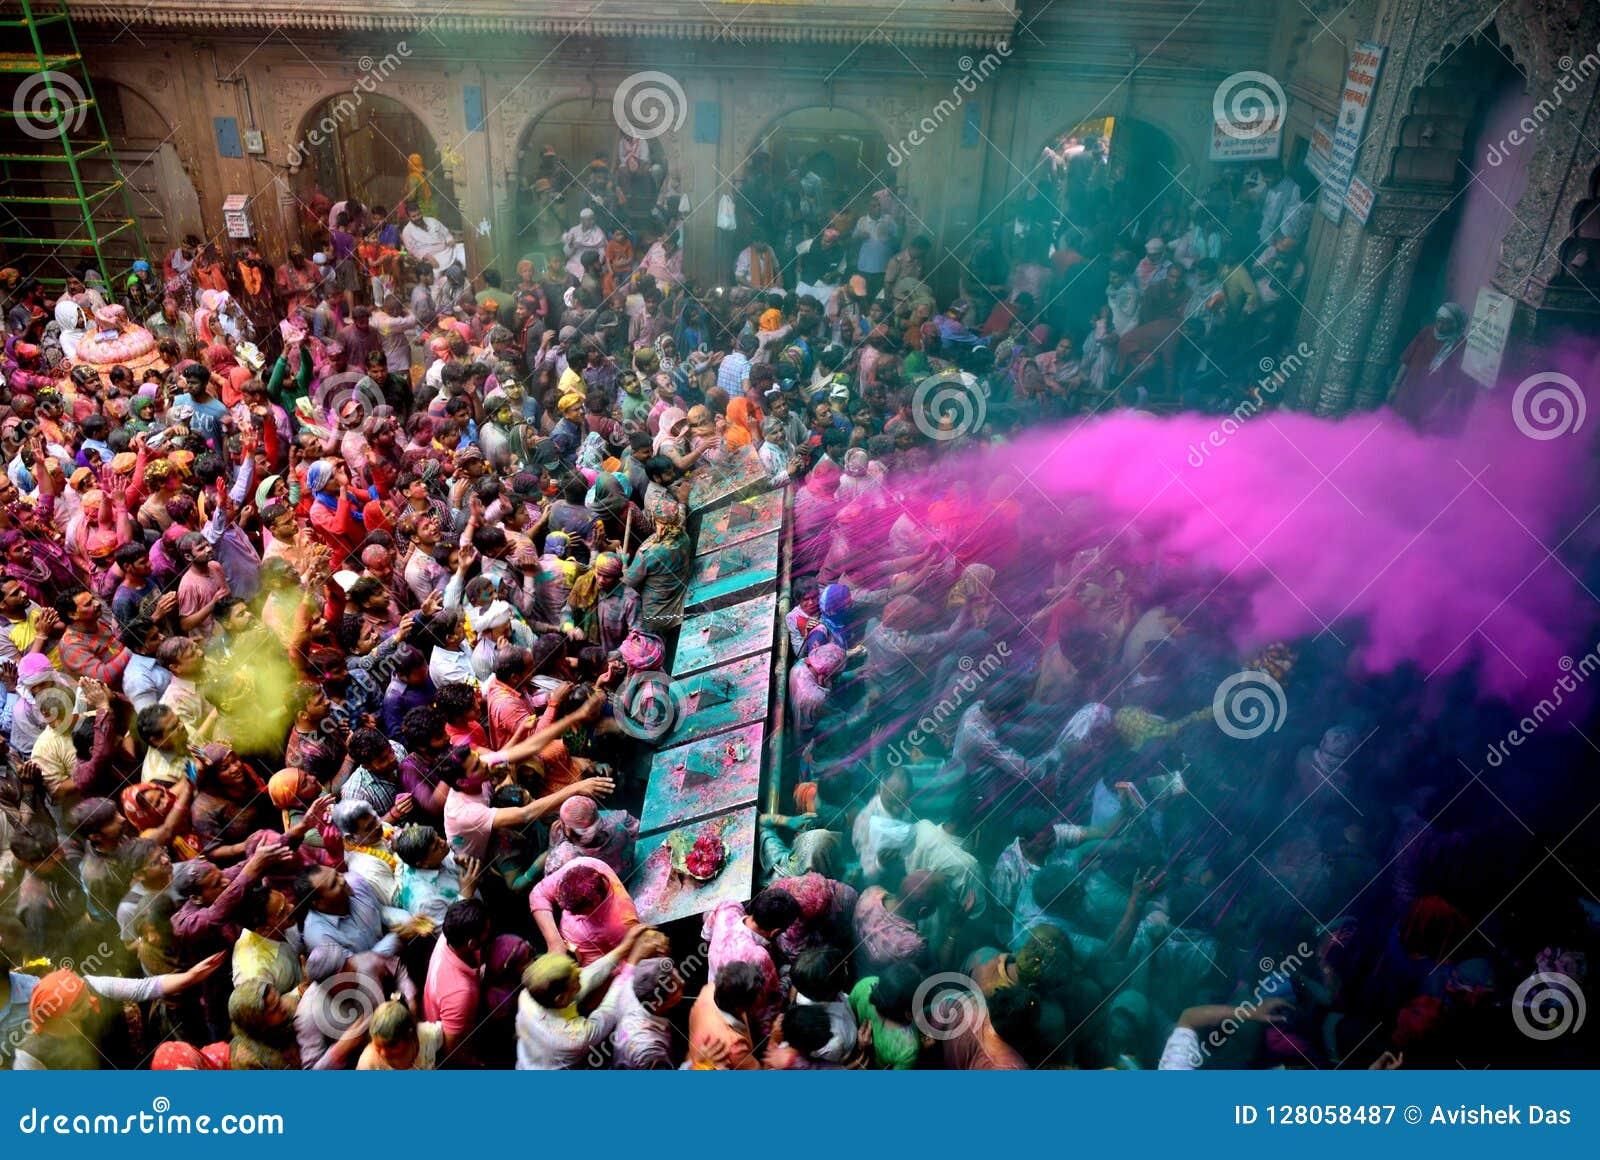 Holi-Festival bei Indien